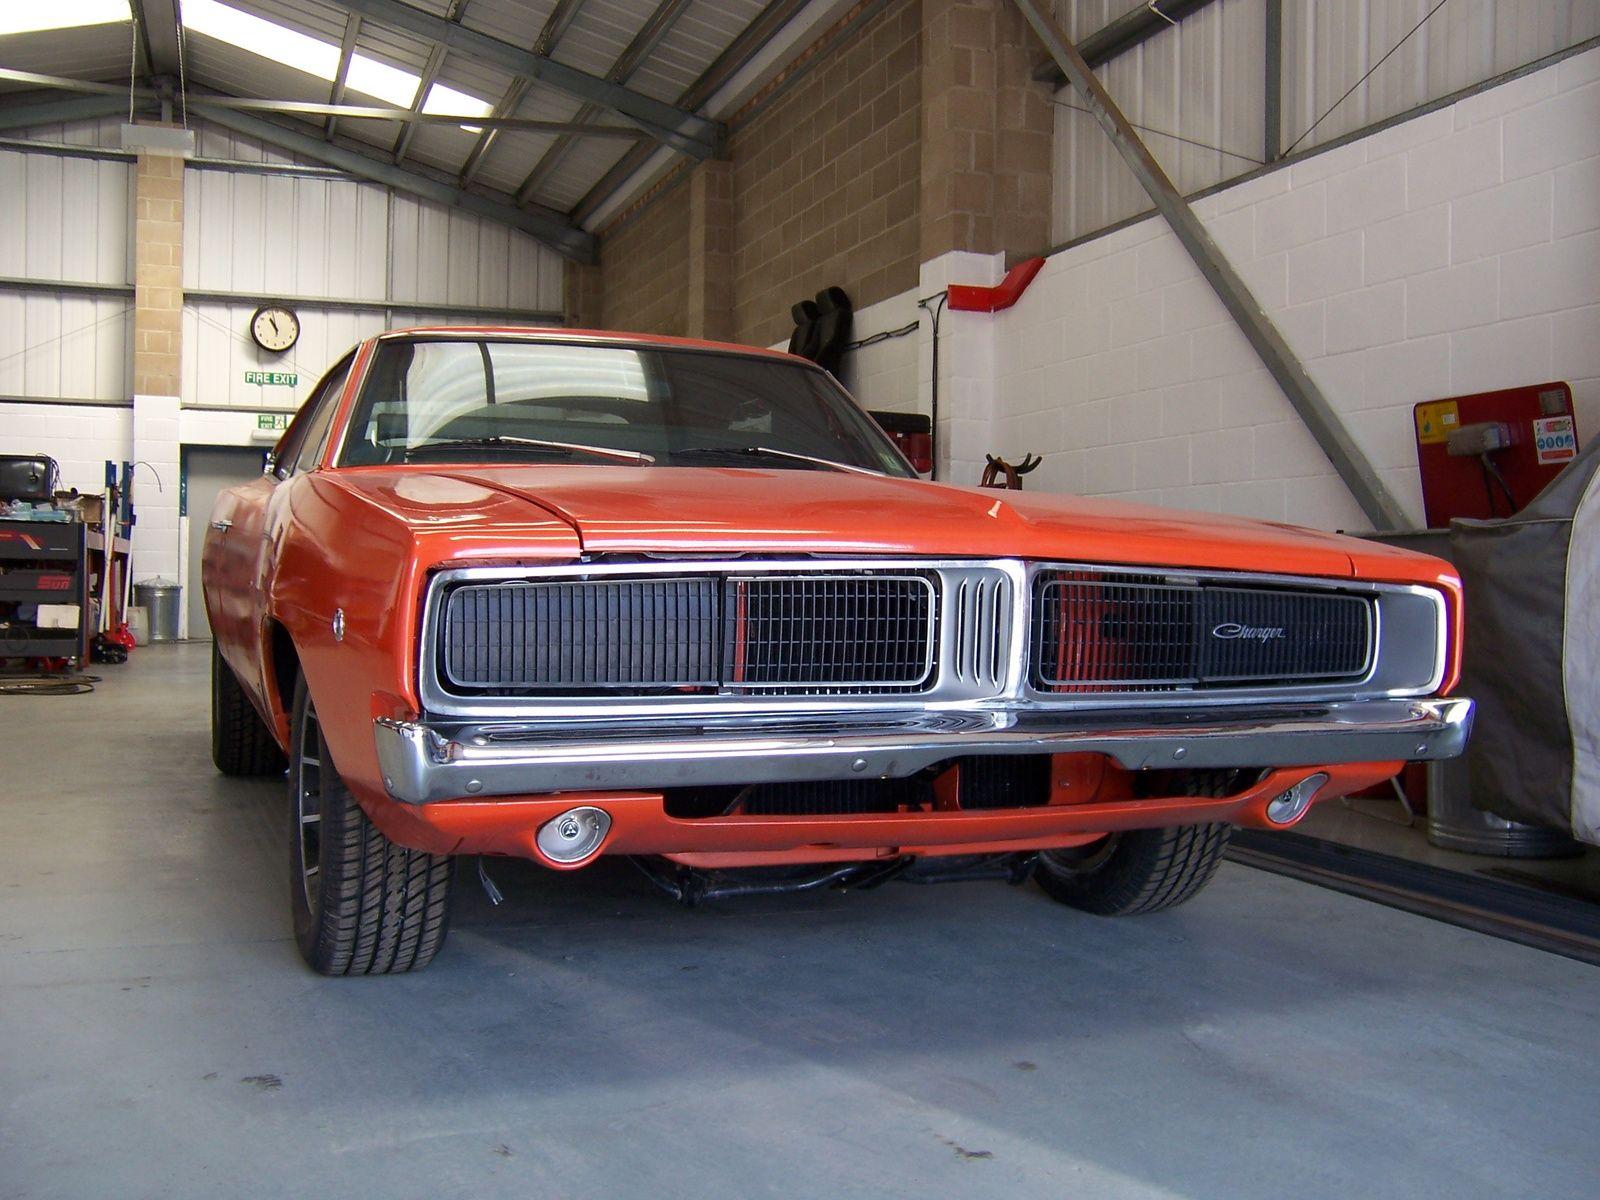 Amazing 1969 Dodge Charger